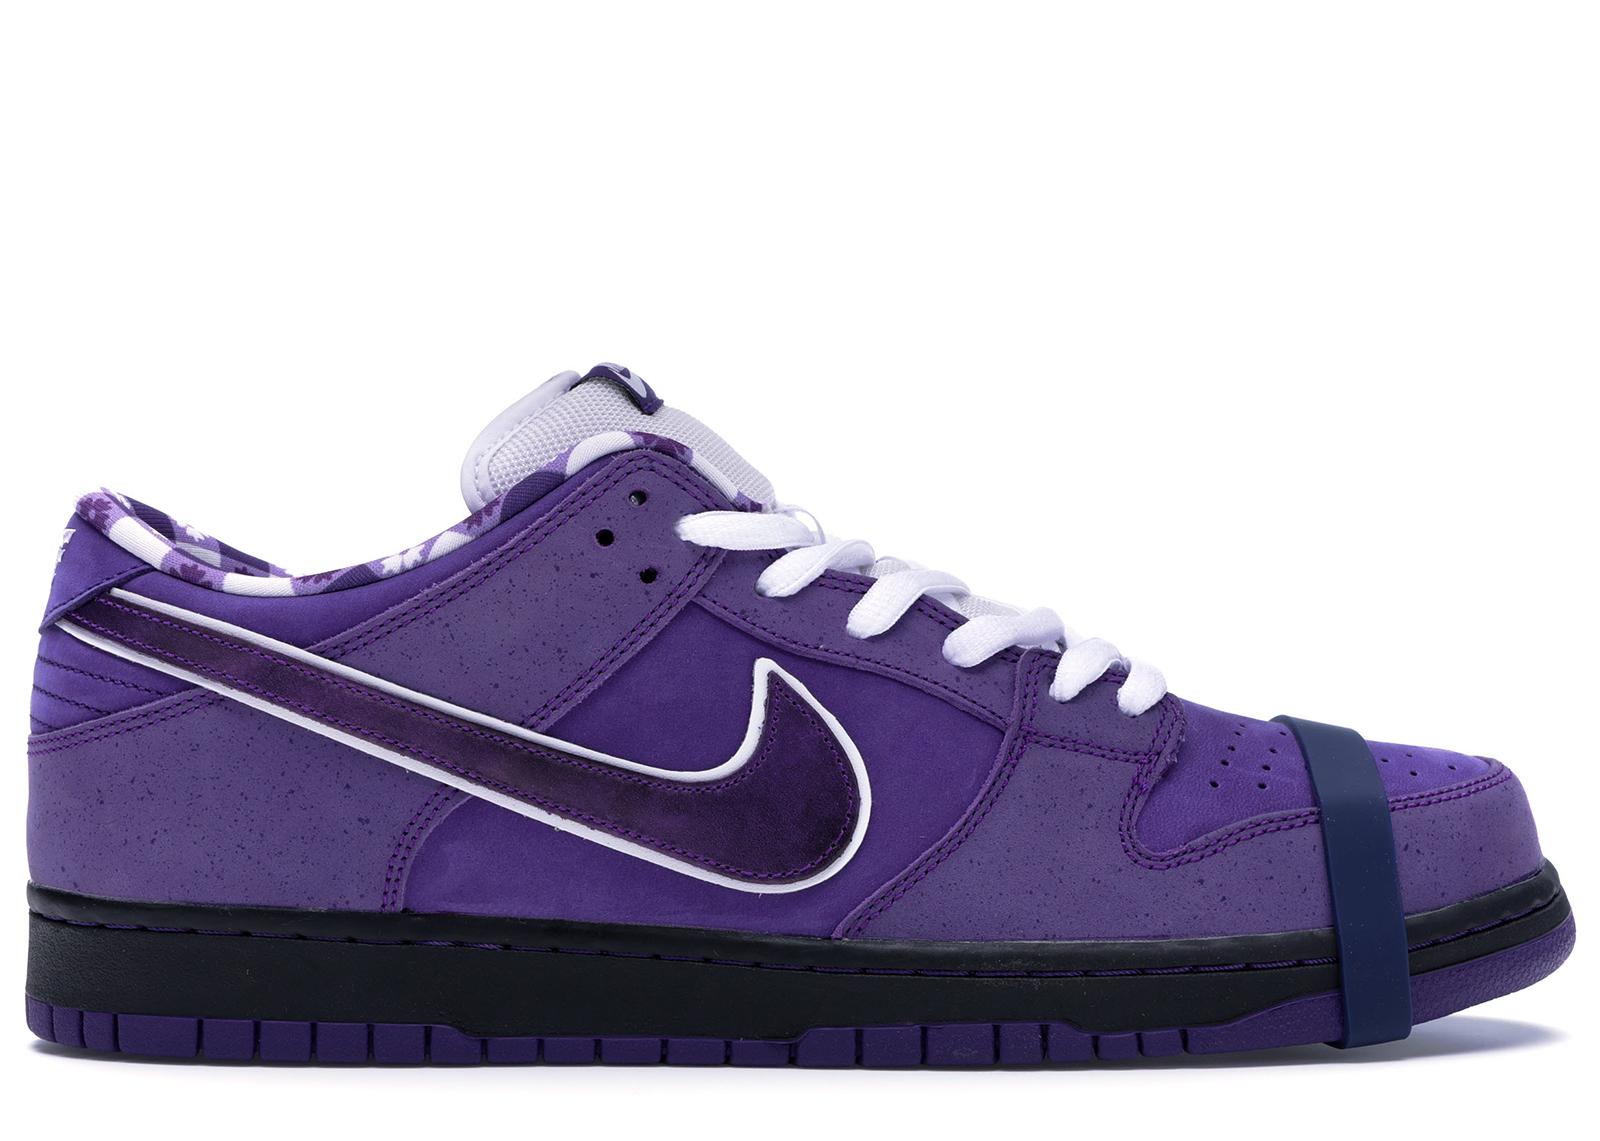 Sb Buy Deadstock Shoesamp; Nike Sneakers mnNv80w